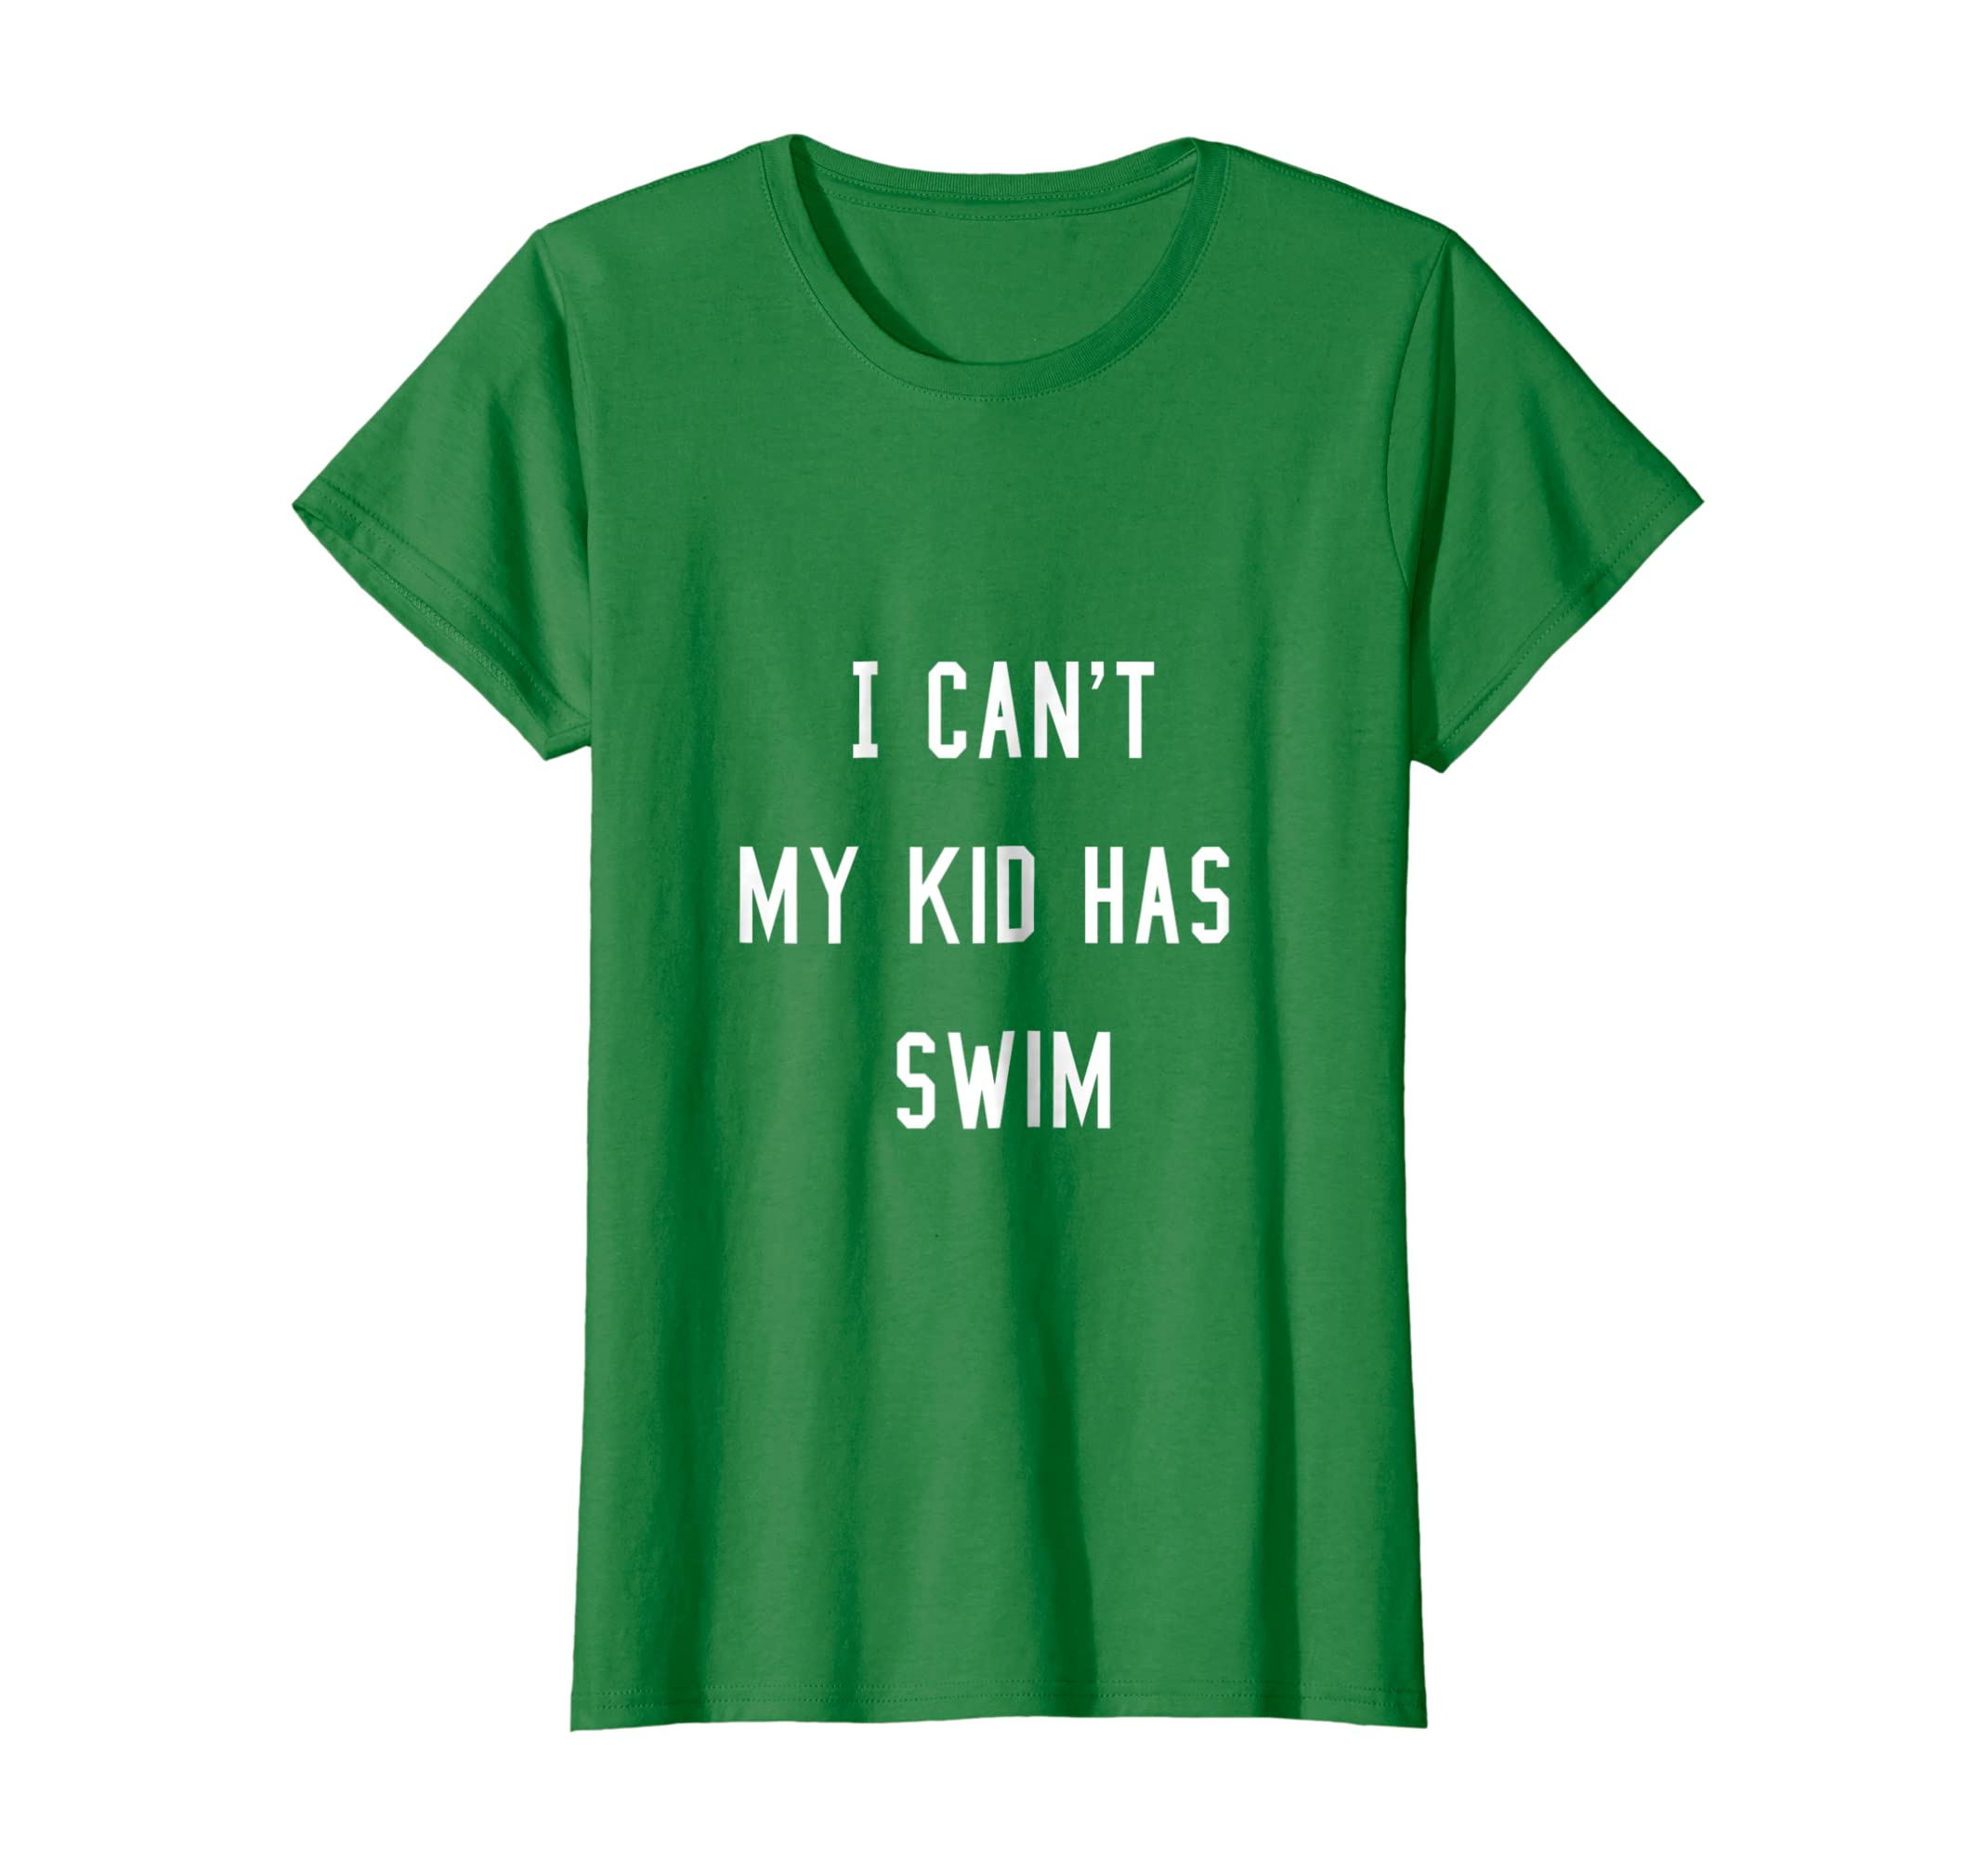 Amazon com: I CAN'T MY KID HAS SWIM - SWIMMING: Clothing